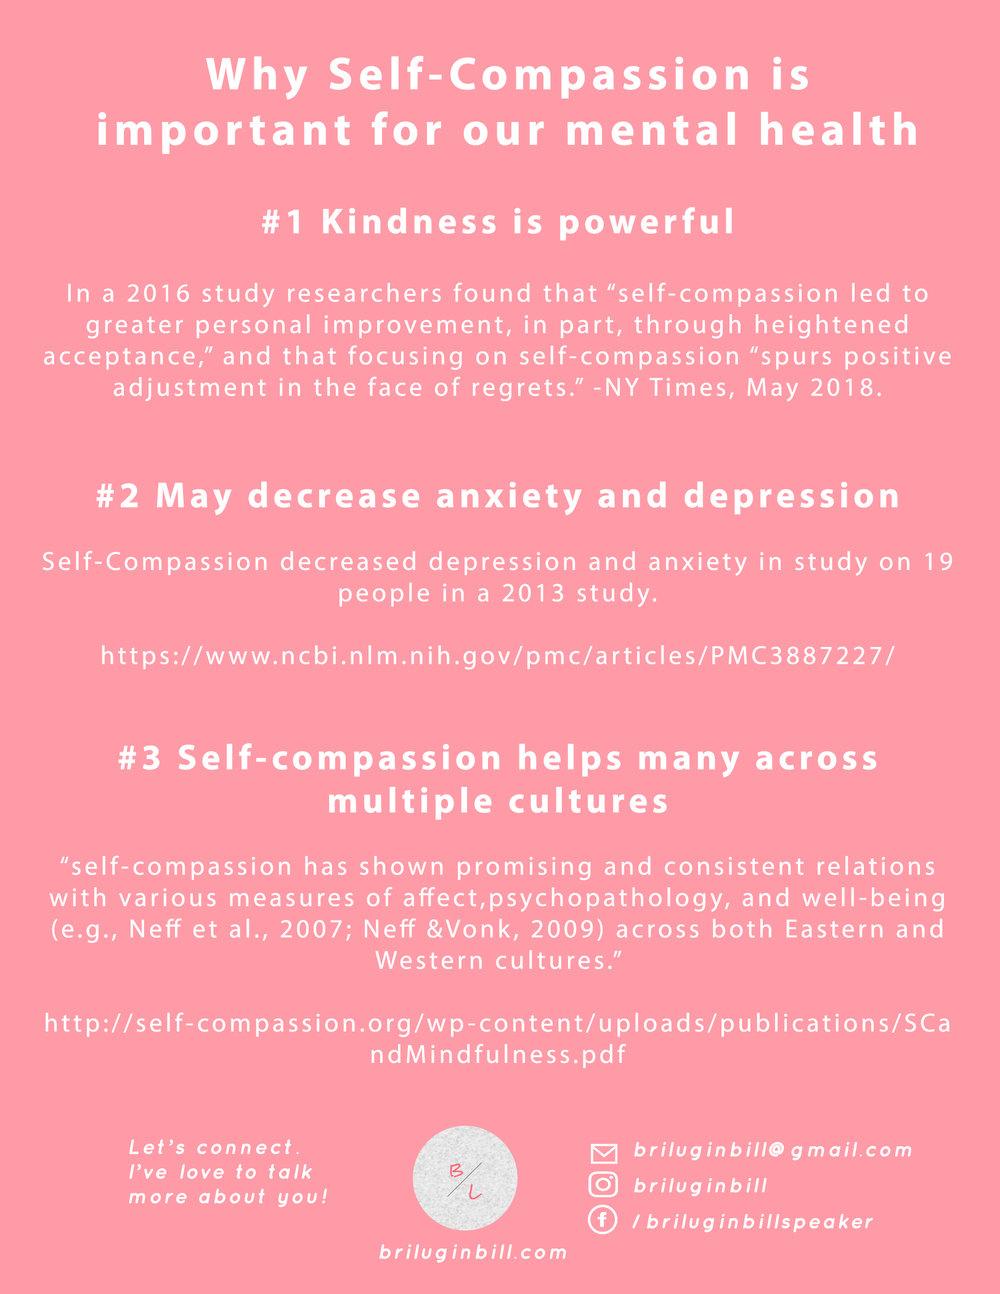 WhySelf-Compassionisimportantformentalhealth.jpg